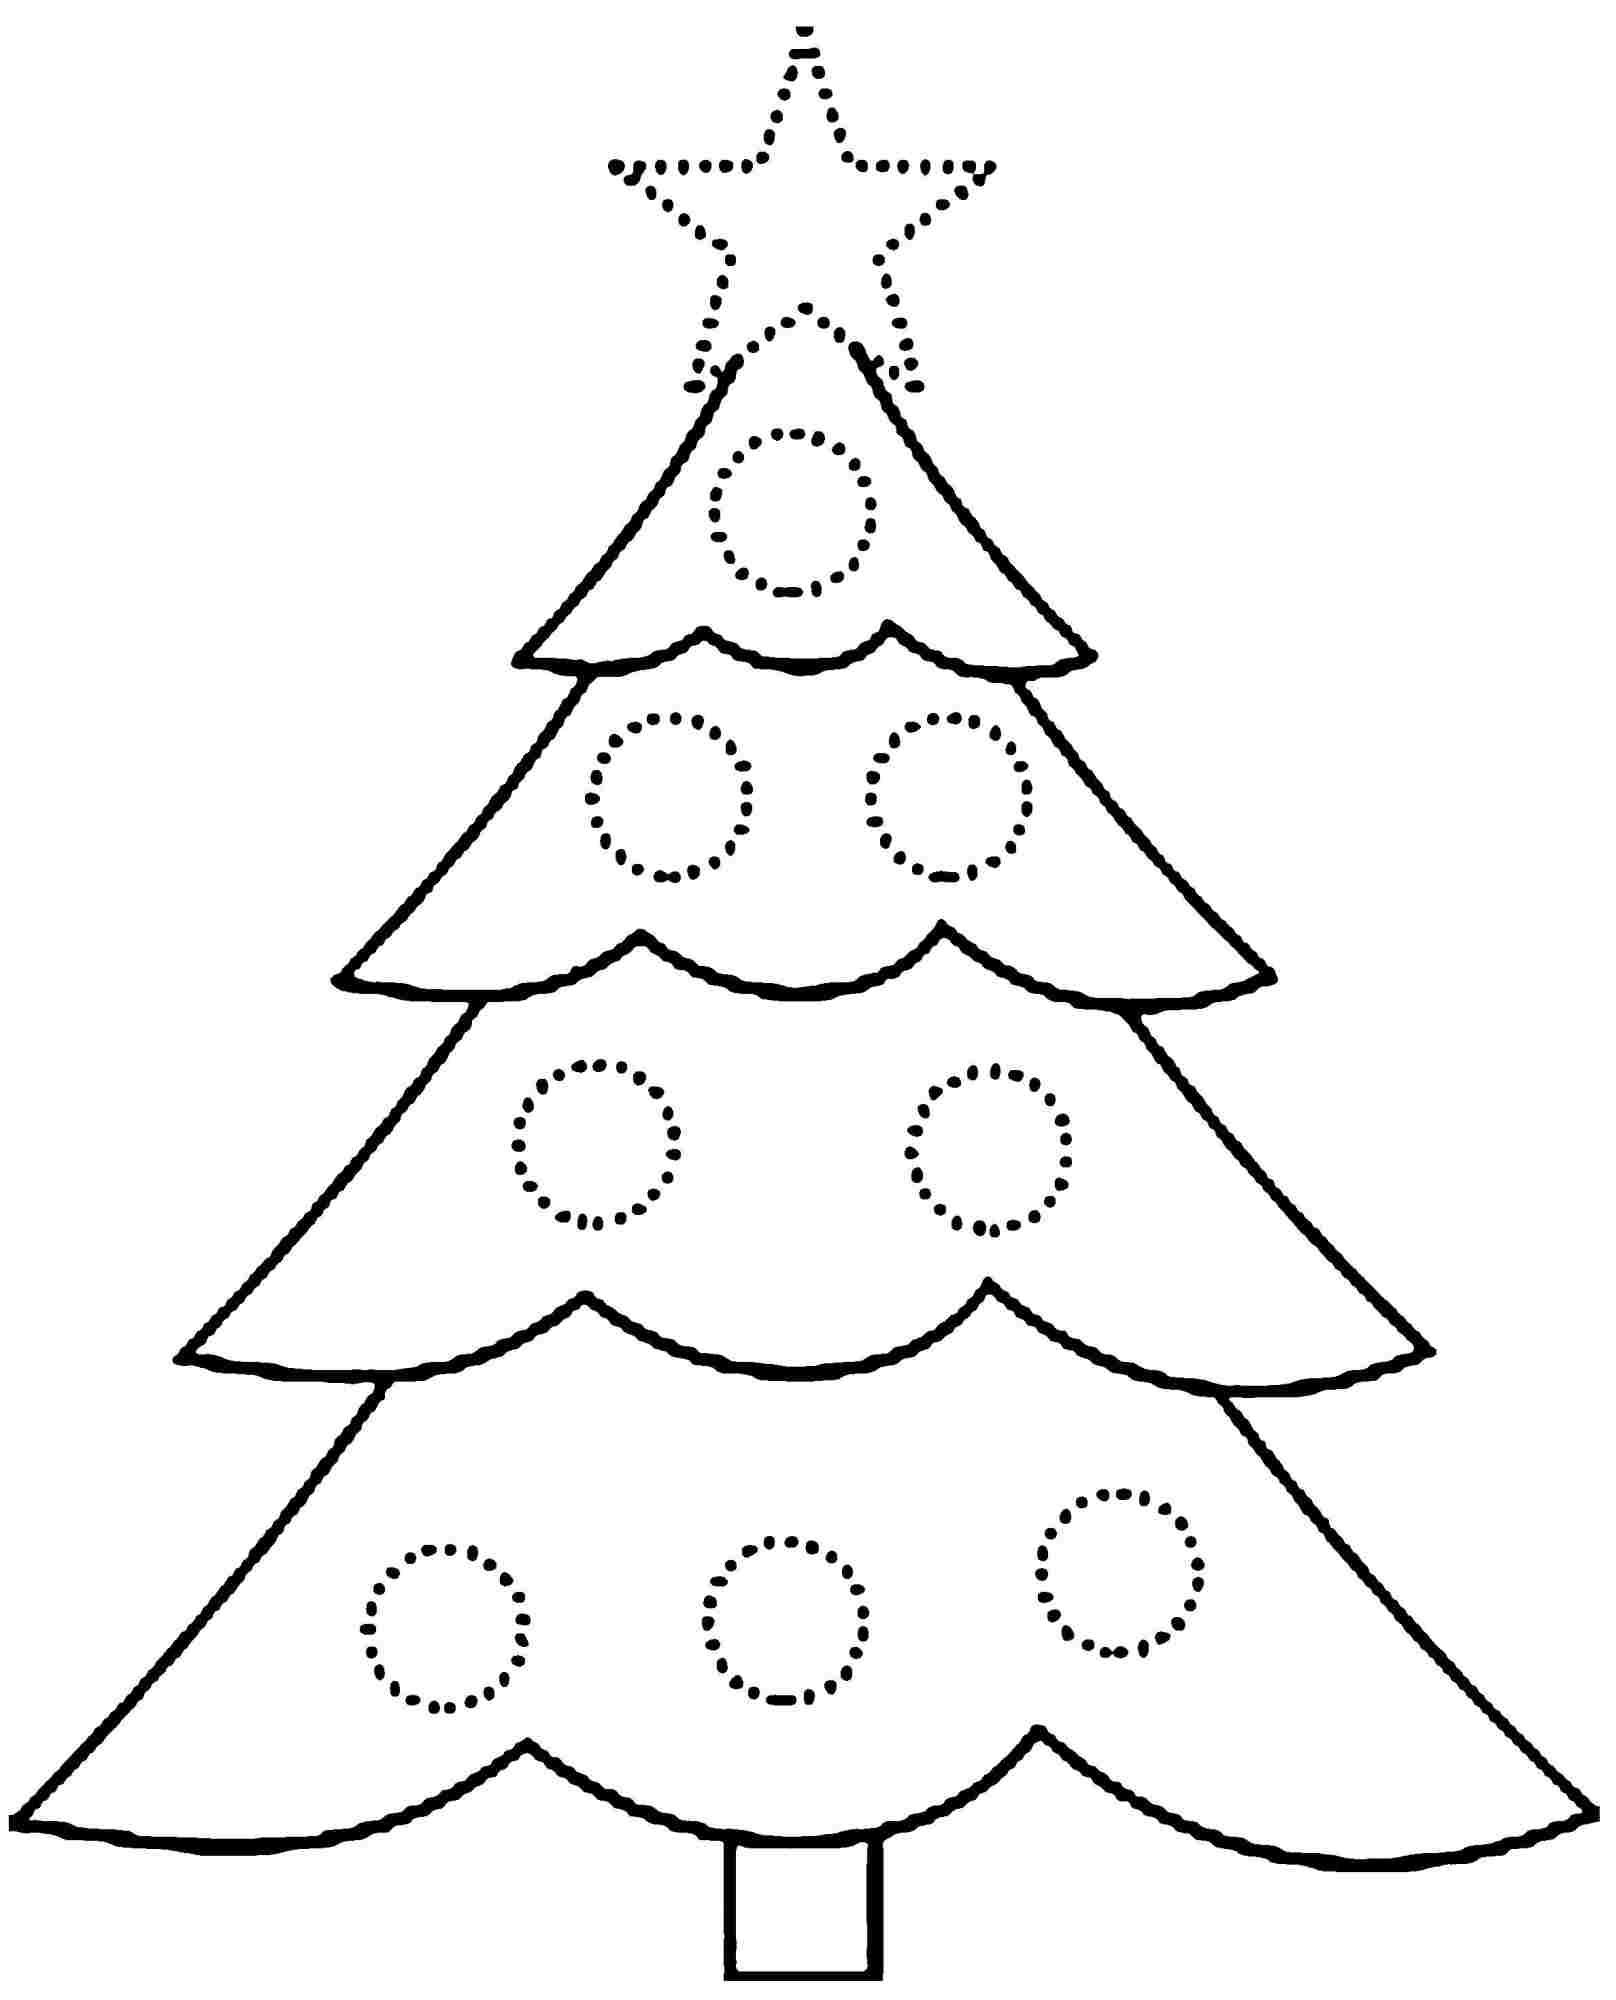 Free Printable Christmas Tree Coloring Page Coloring Home